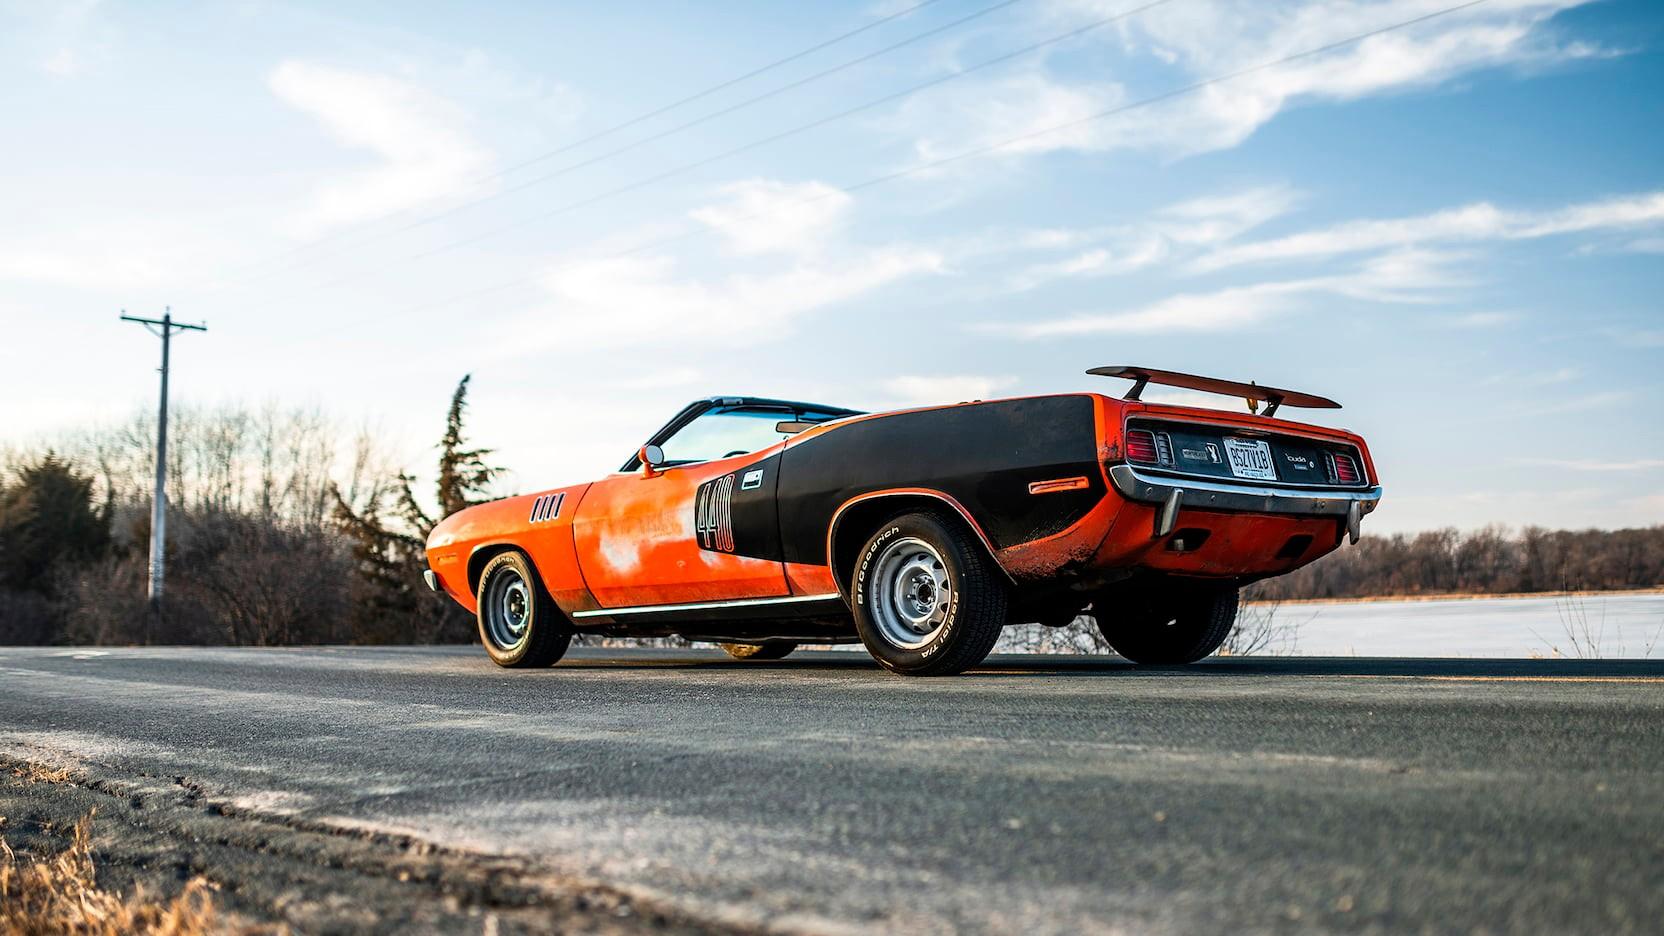 Ржавый американский авто 70-х продают по цене двух Lamborghini